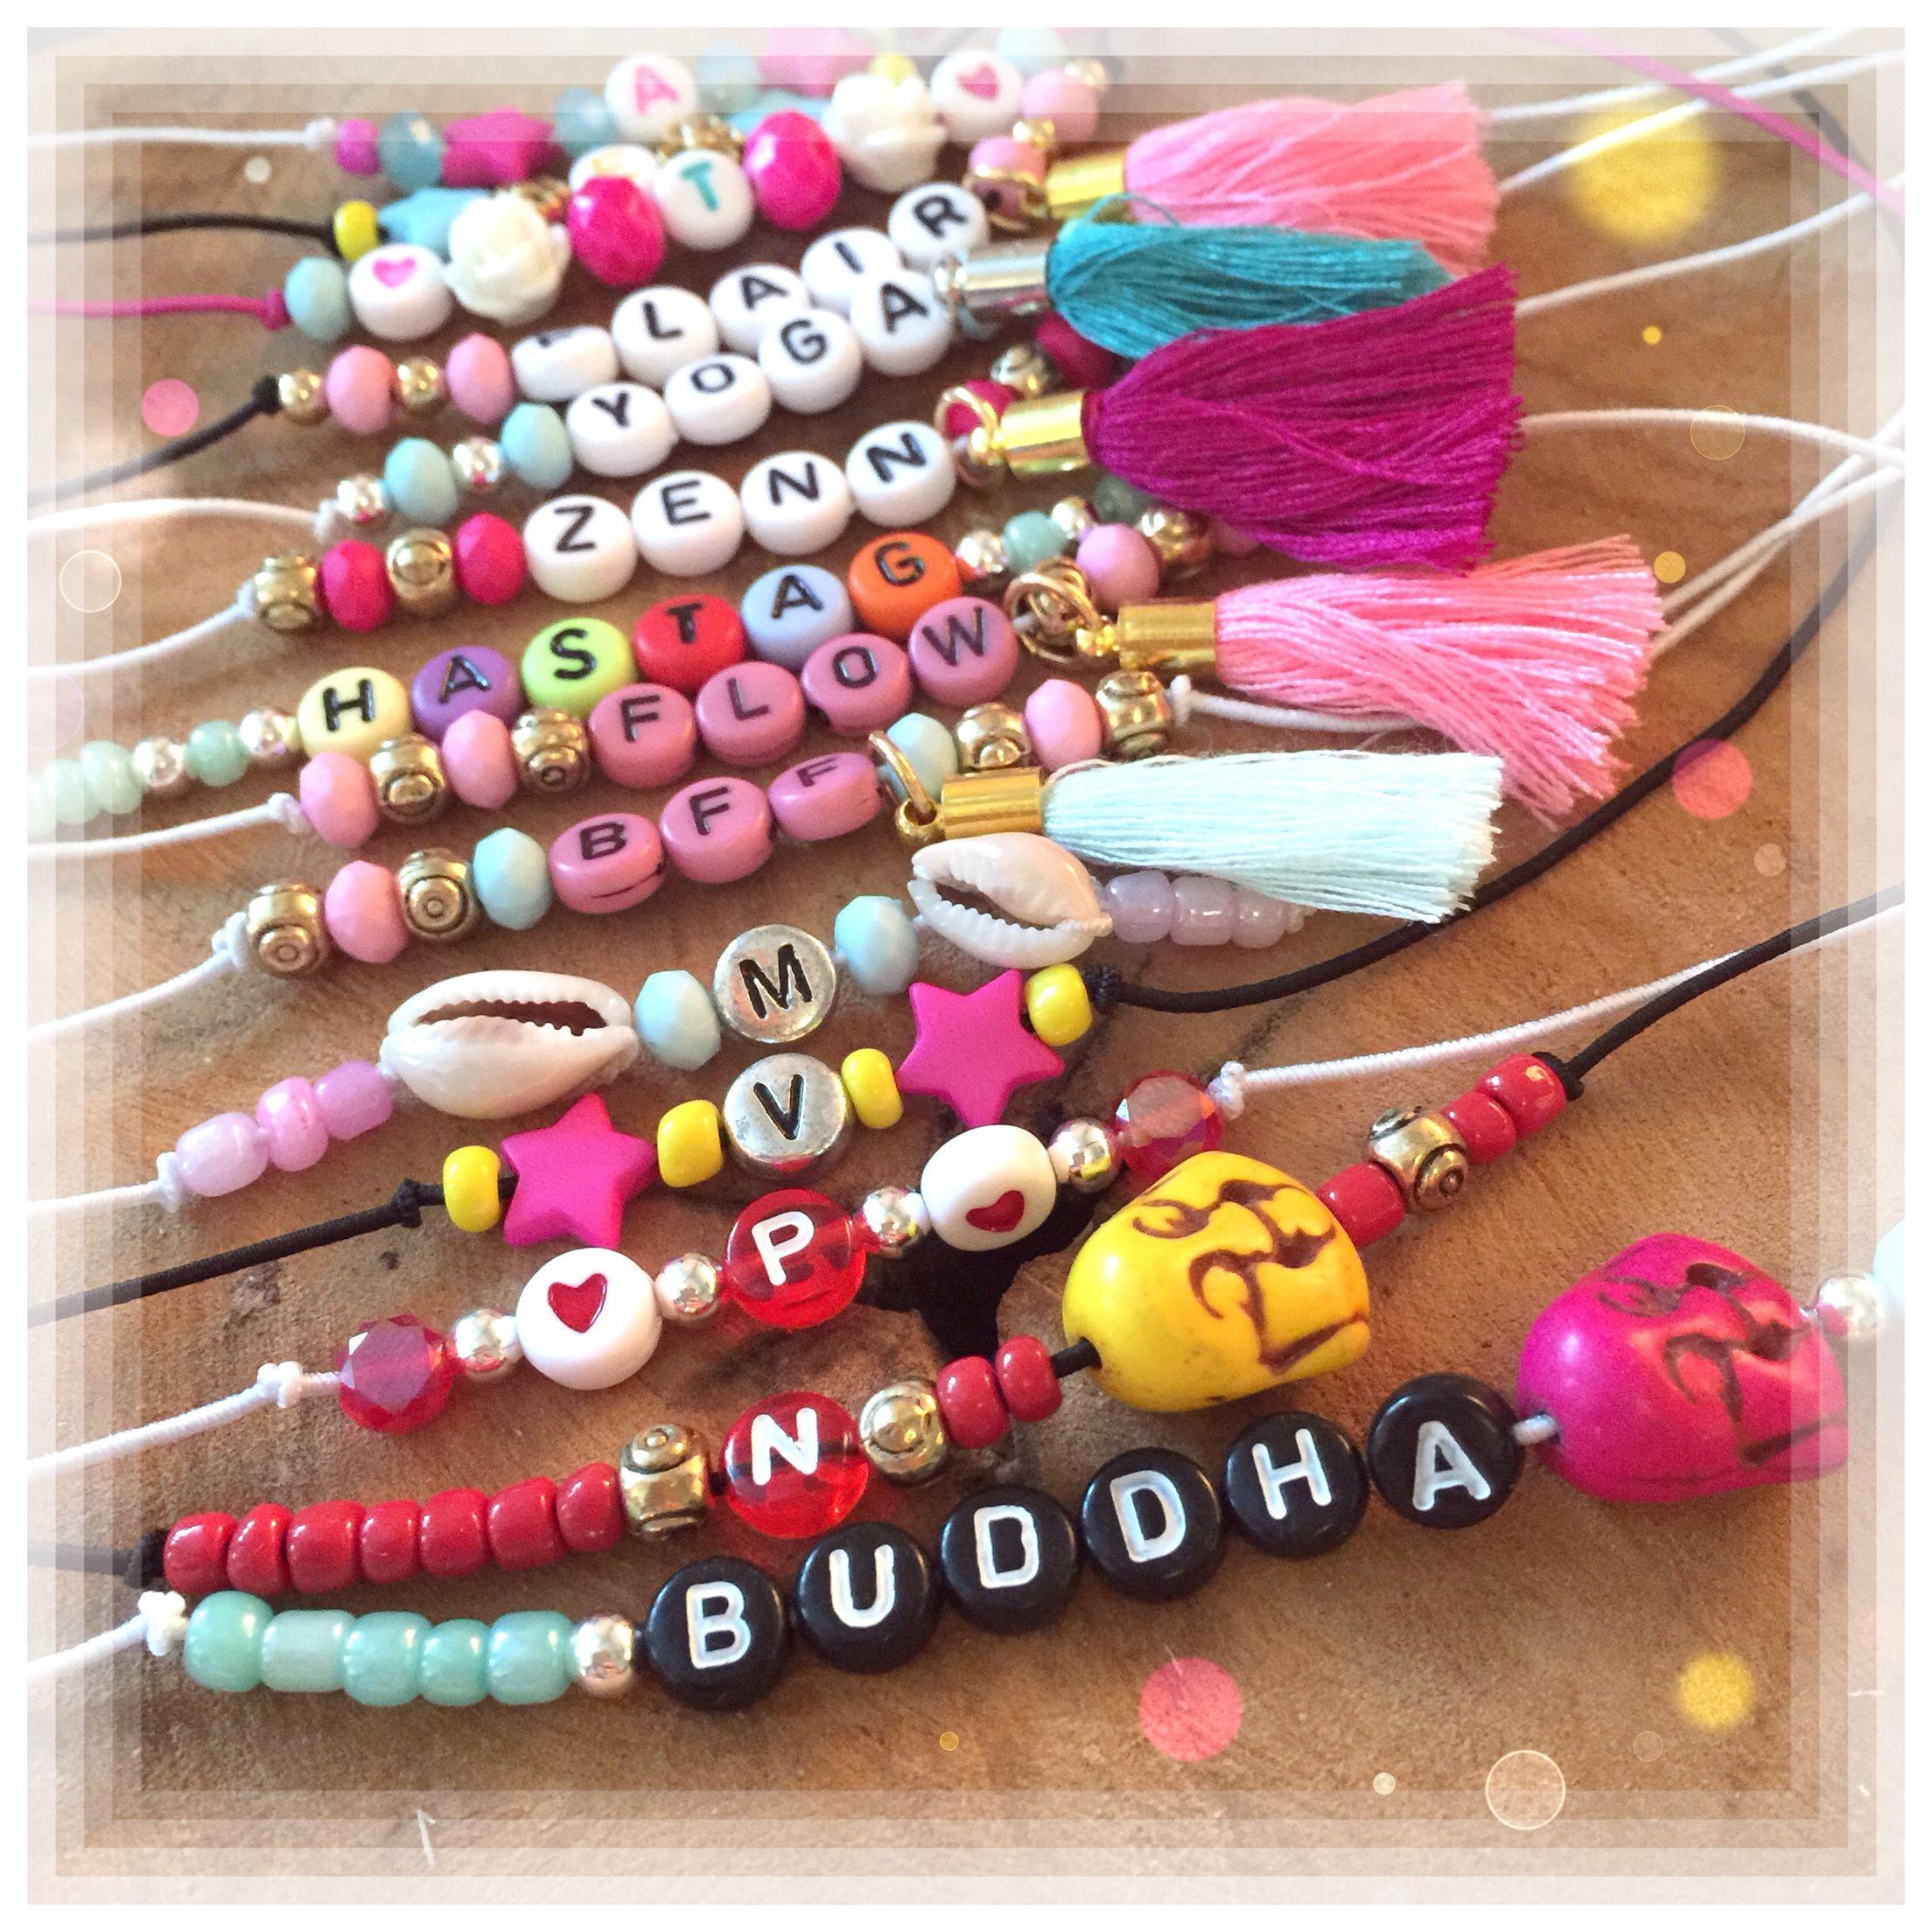 Letter Bead Bracelets Handmade by SaZjewelry | Letter bead ...